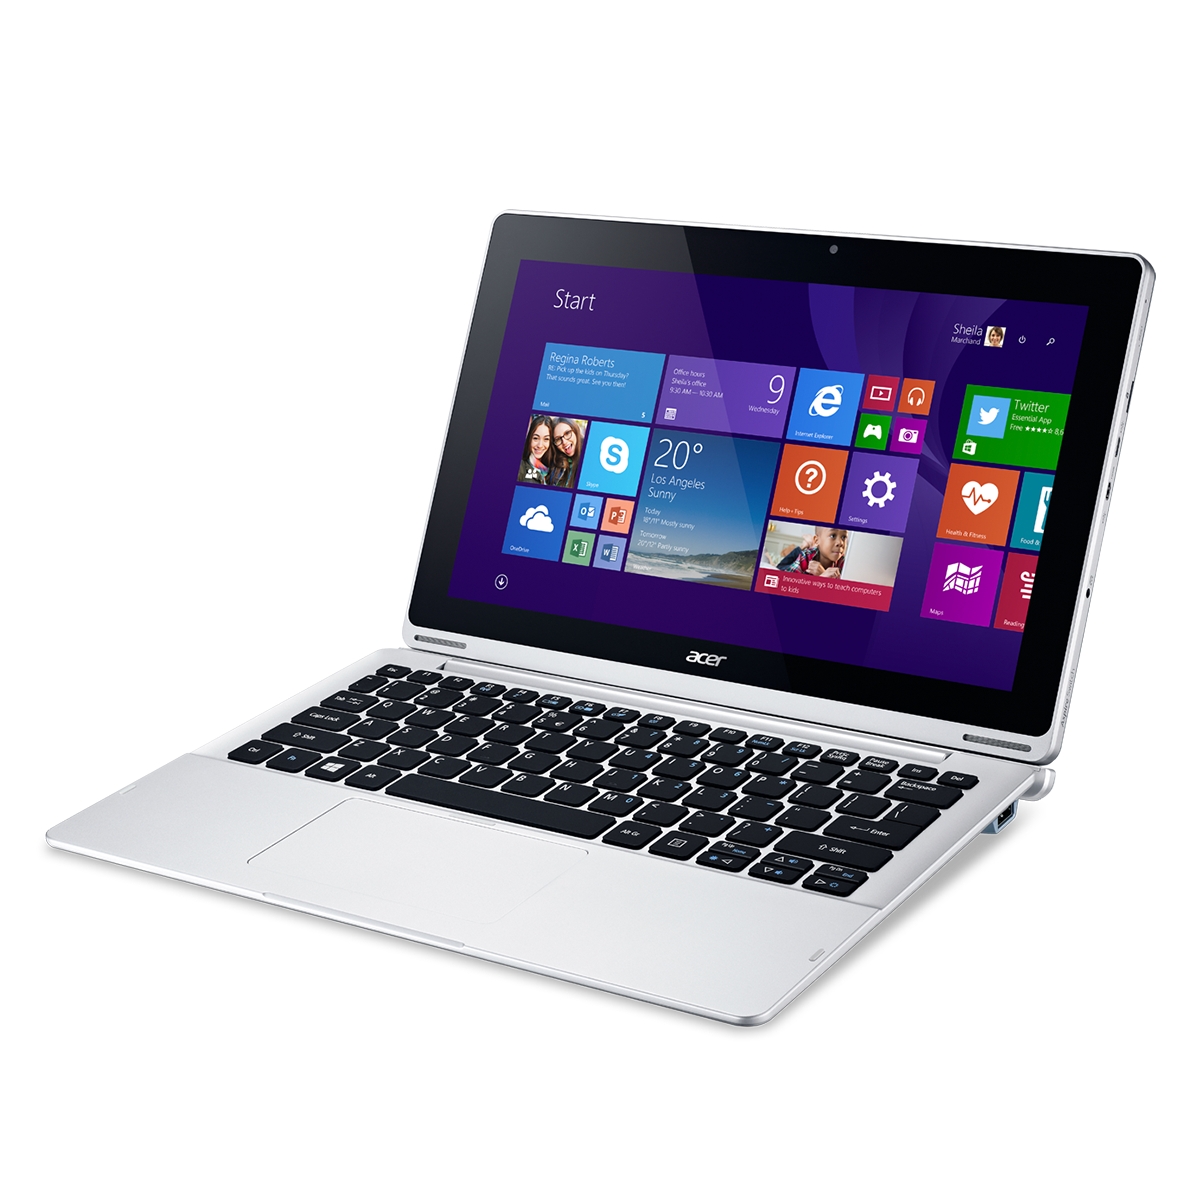 sw5 111 18dy laptops tech specs reviews acer. Black Bedroom Furniture Sets. Home Design Ideas